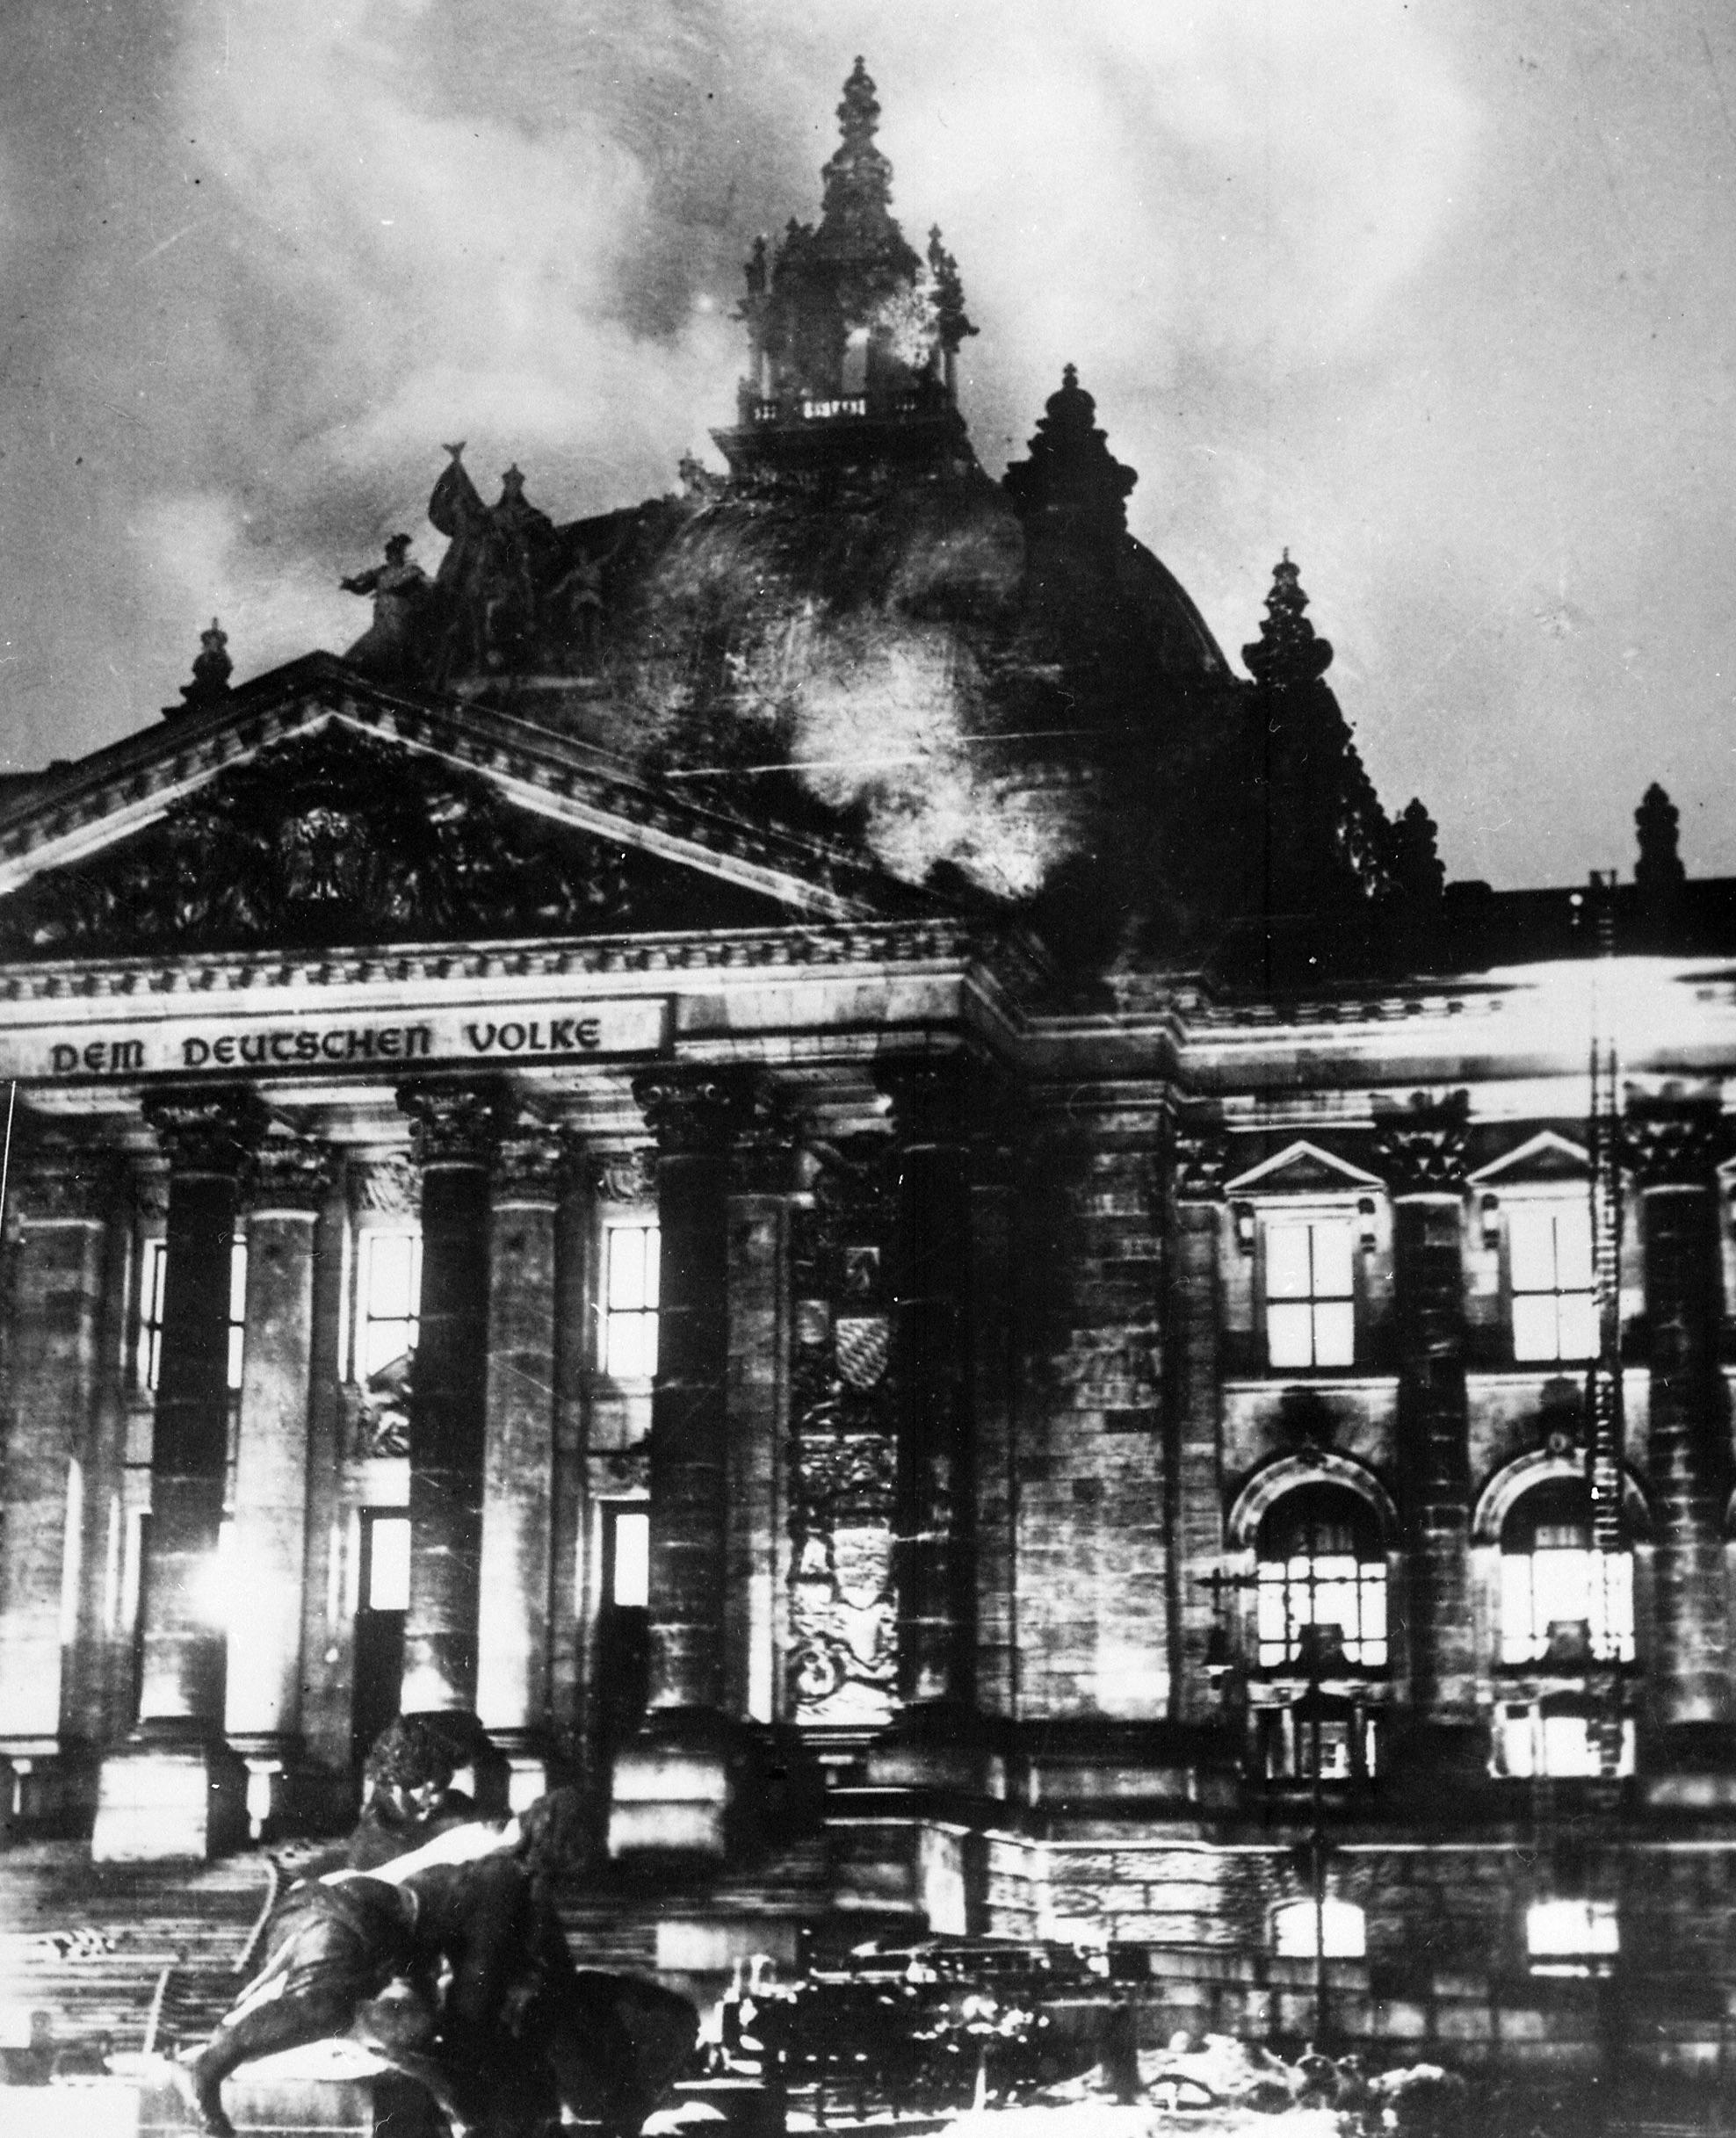 https://i0.wp.com/upload.wikimedia.org/wikipedia/commons/2/20/Reichstagsbrand.jpg